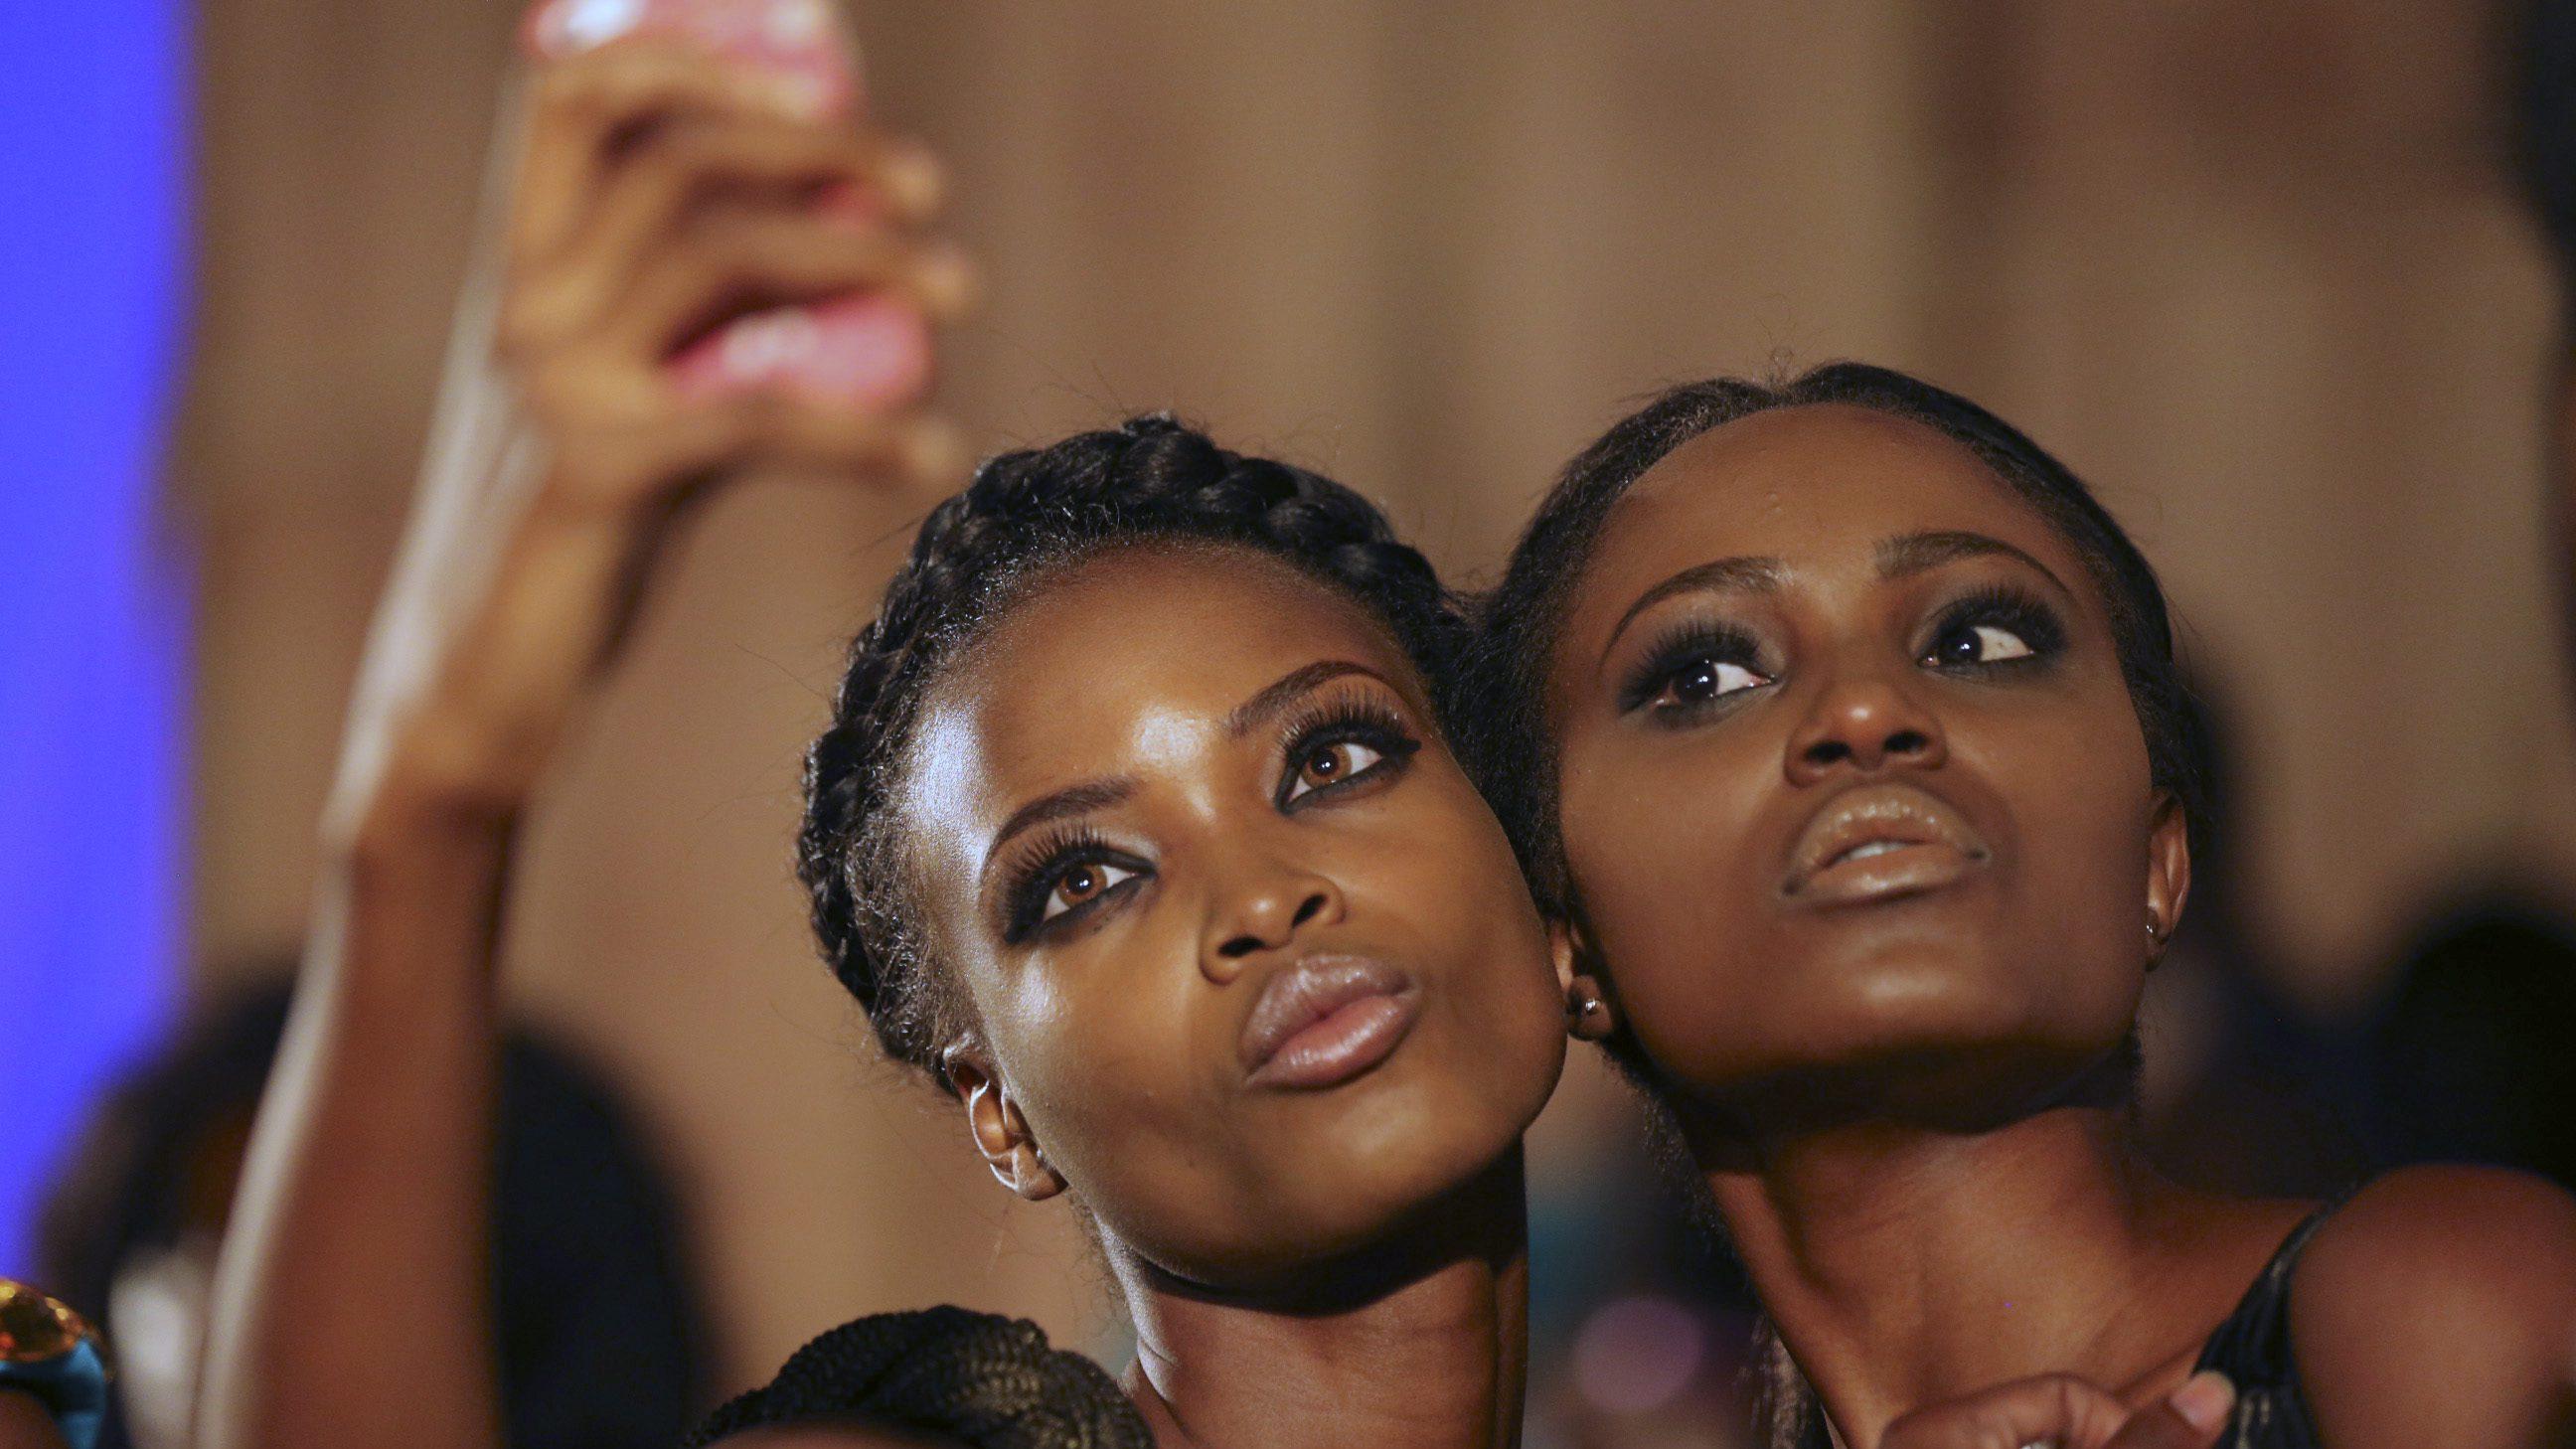 Models take a selfie backstage during Lagos fashion and design week October 29, 2014.